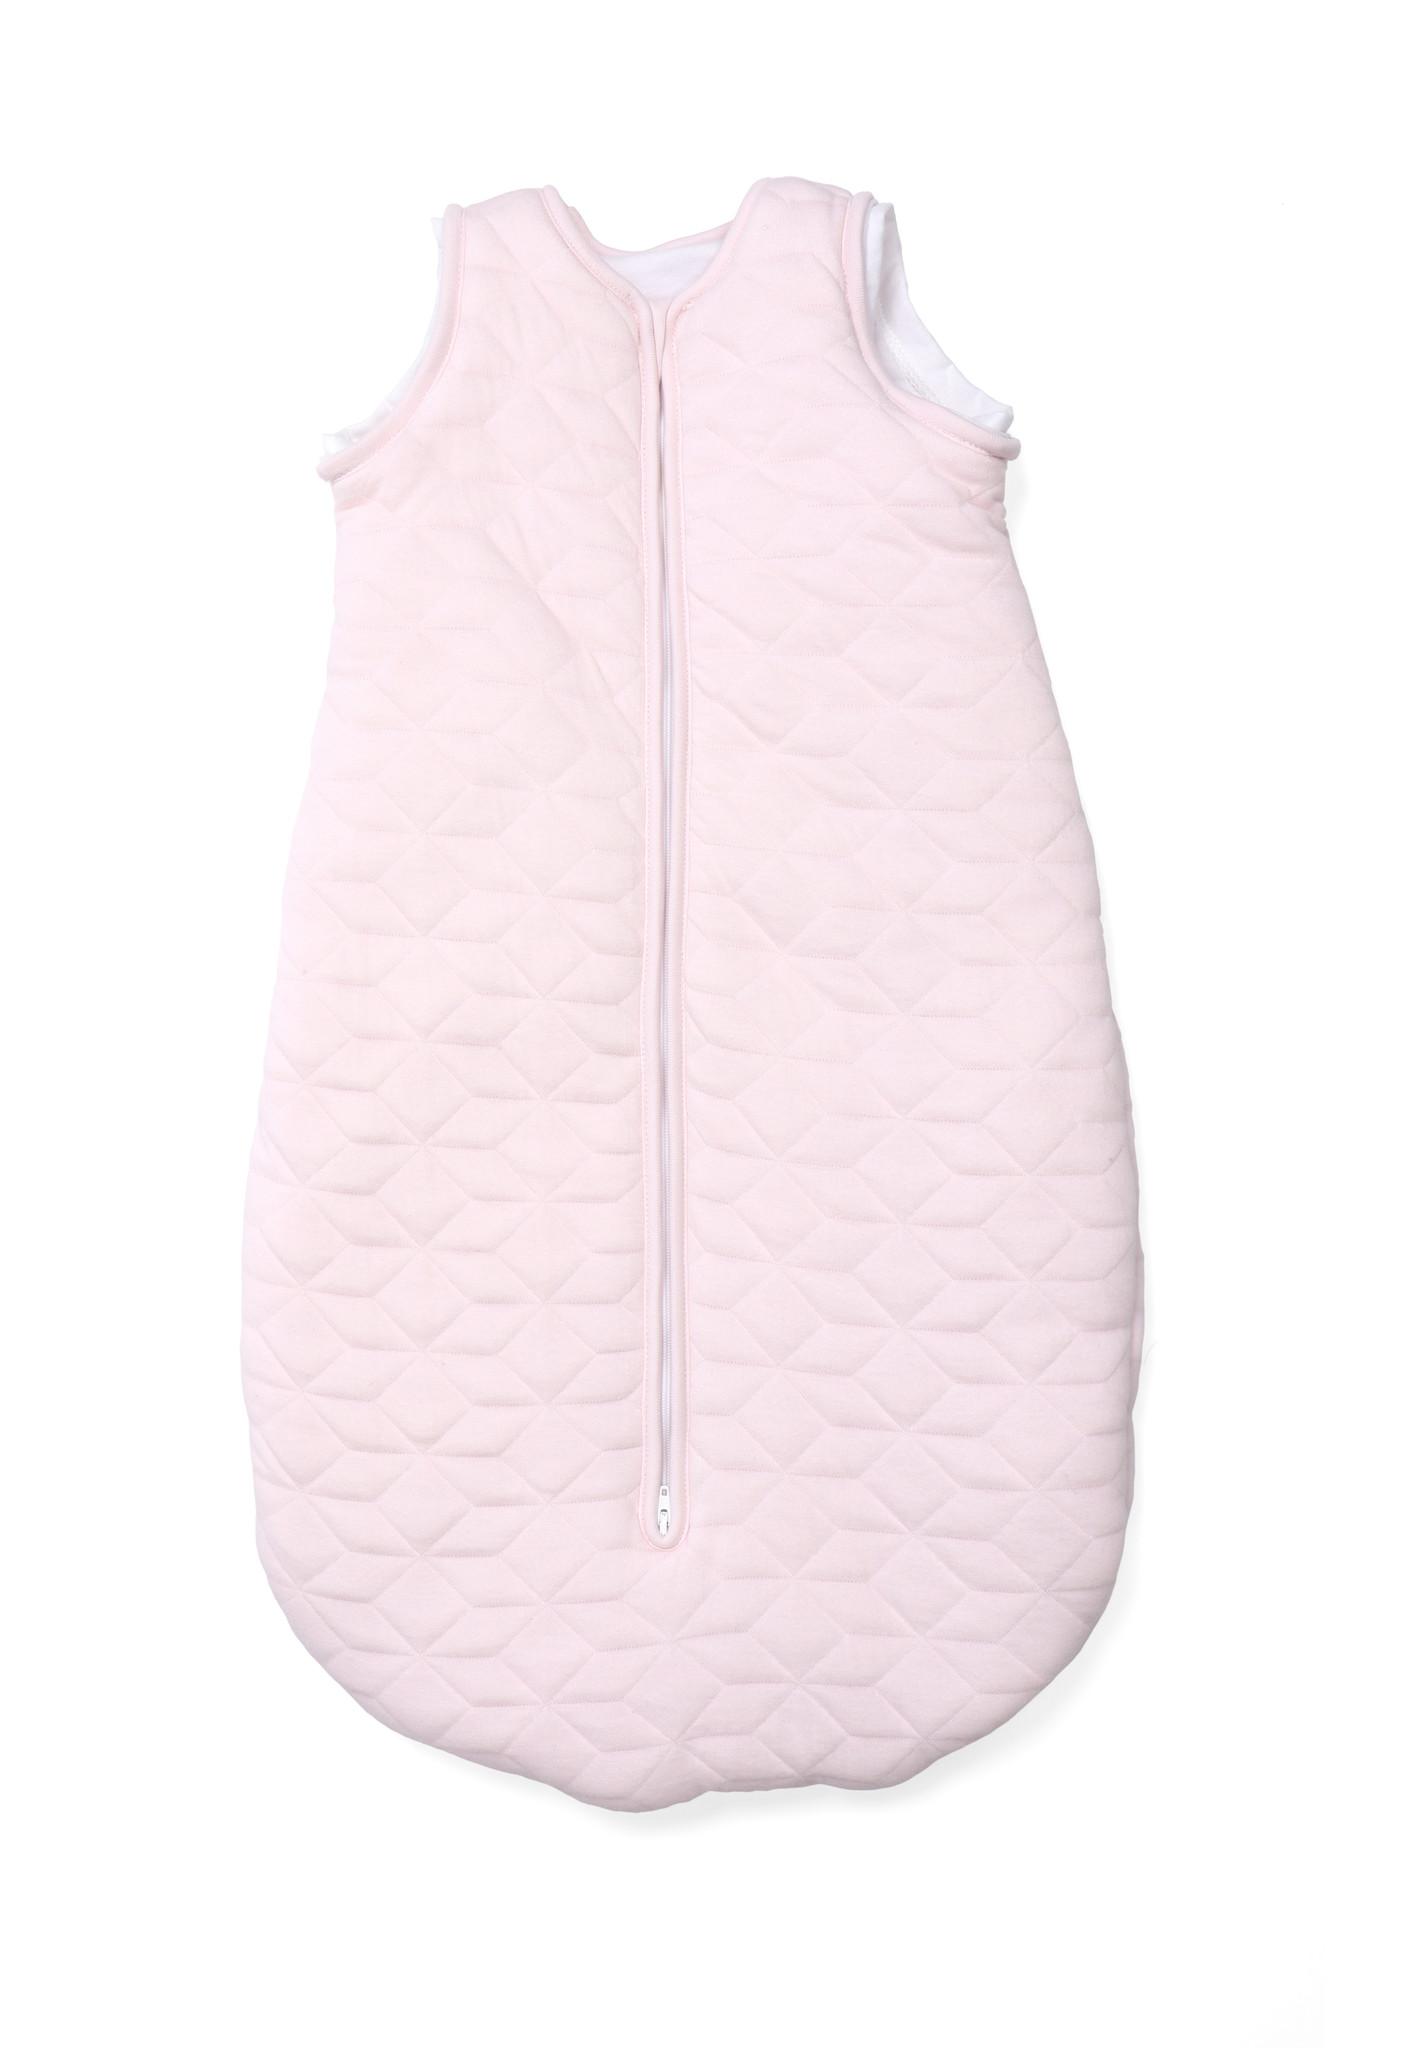 Jersey slaapzak 70cm met afritsbare mouwen Star Soft Pink-4